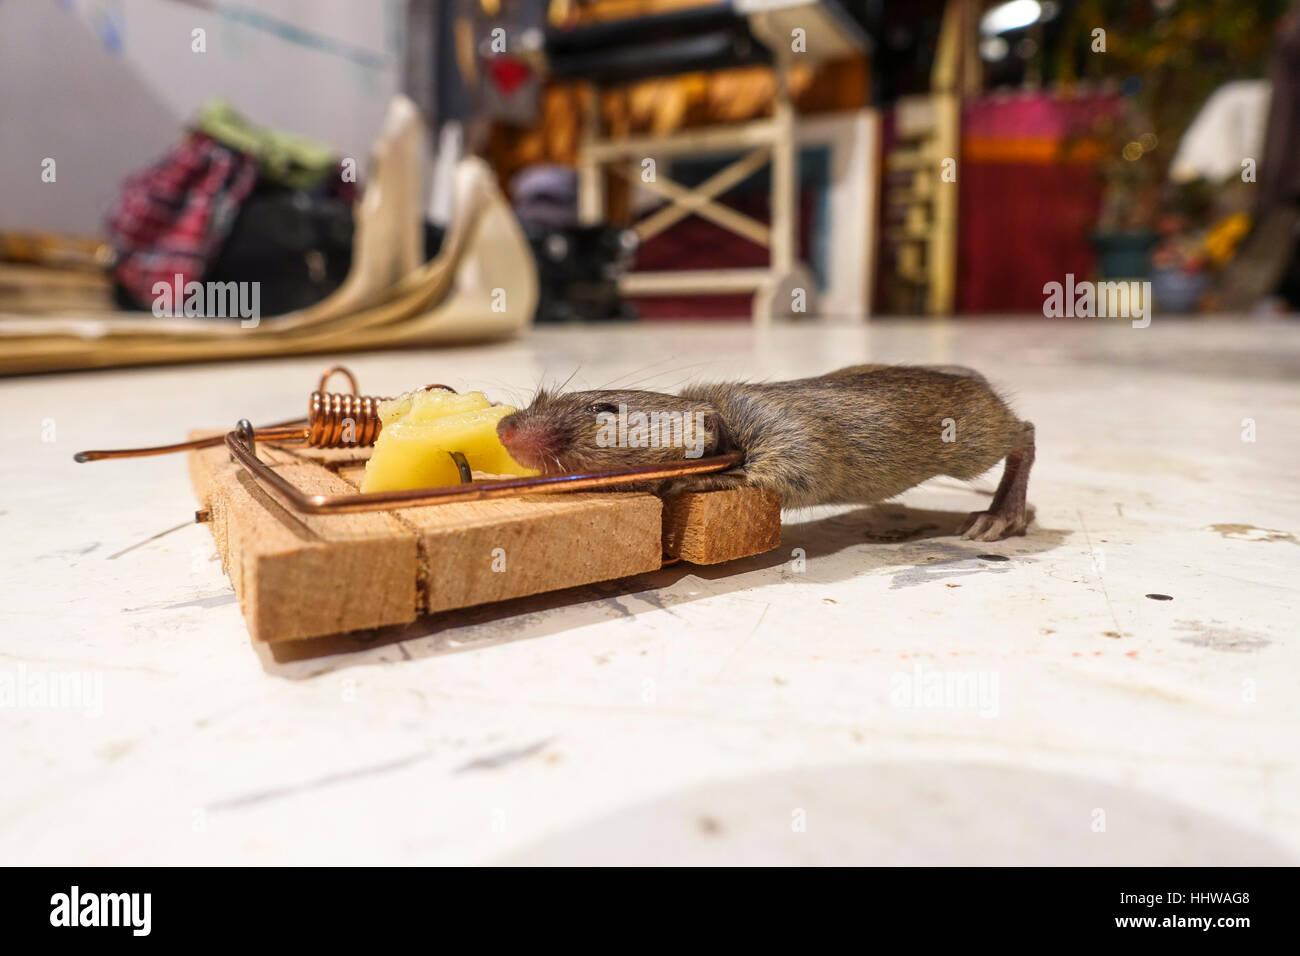 mice cheese stockfotos mice cheese bilder alamy. Black Bedroom Furniture Sets. Home Design Ideas